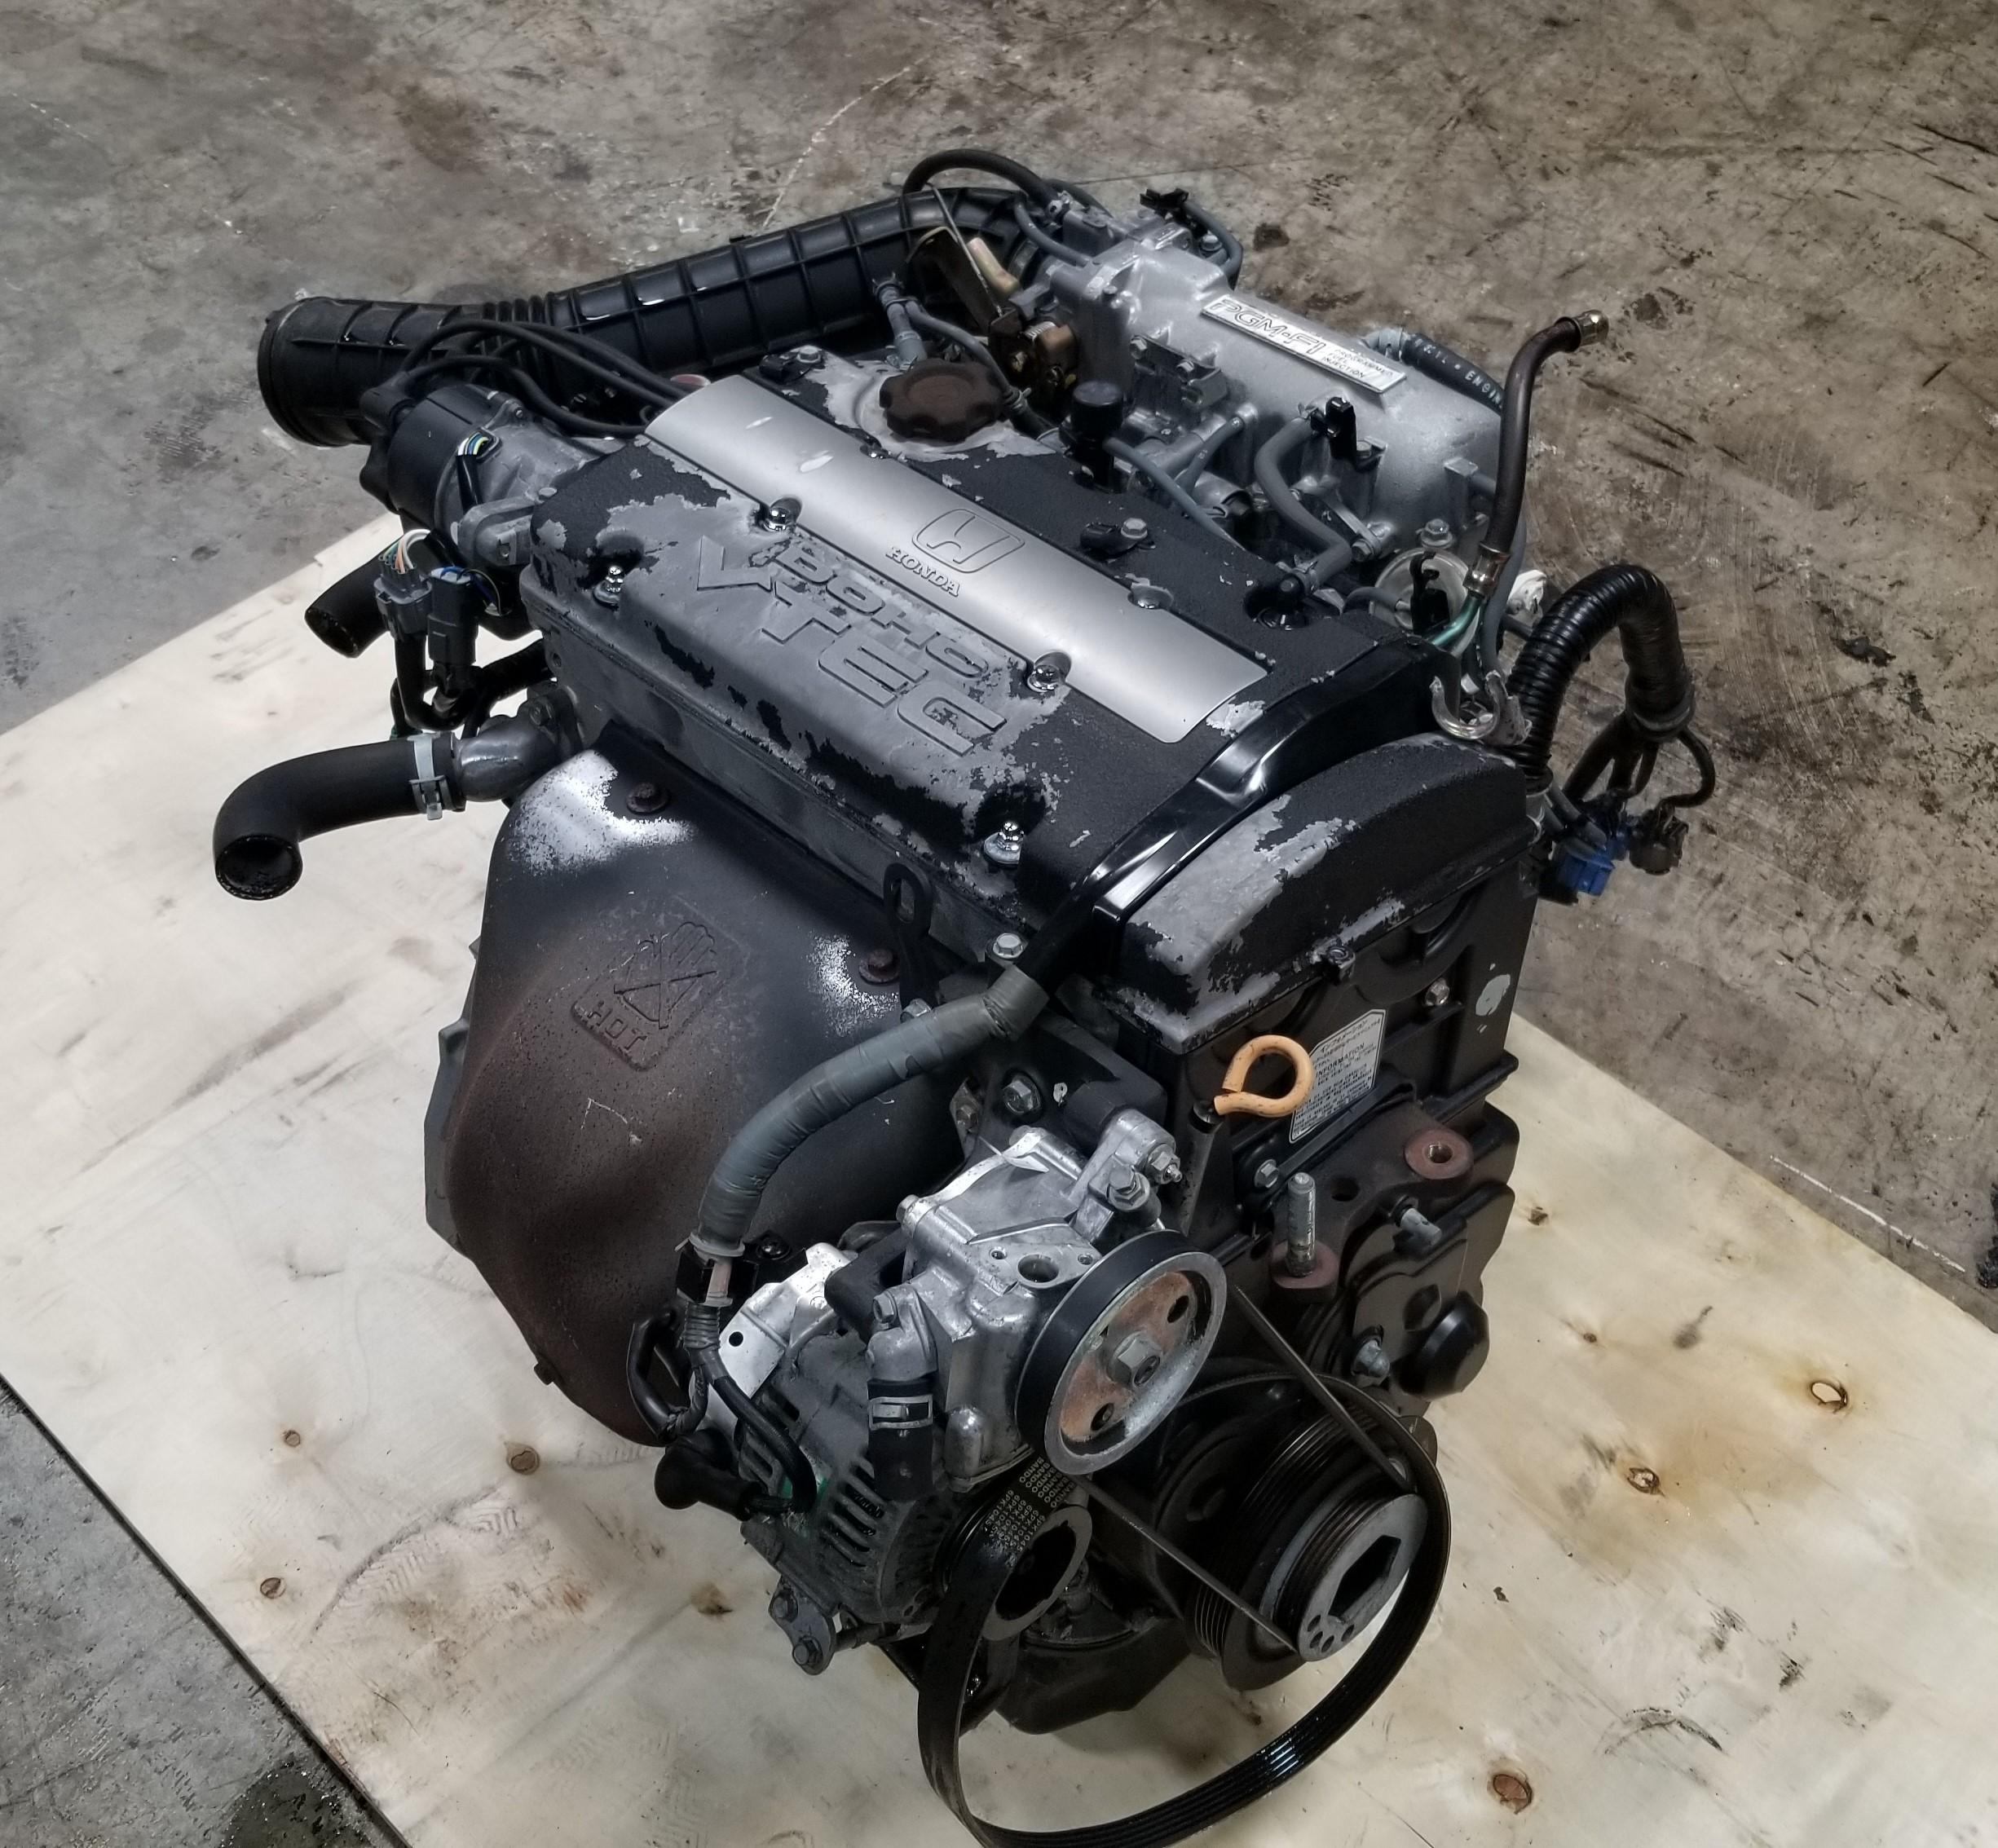 Honda Chula Vista >> H22A 1992-2001 Honda Accord Prelude 2.2L VTEC DOHC Engine OBD1/OBD2 | JDM Of San Diego